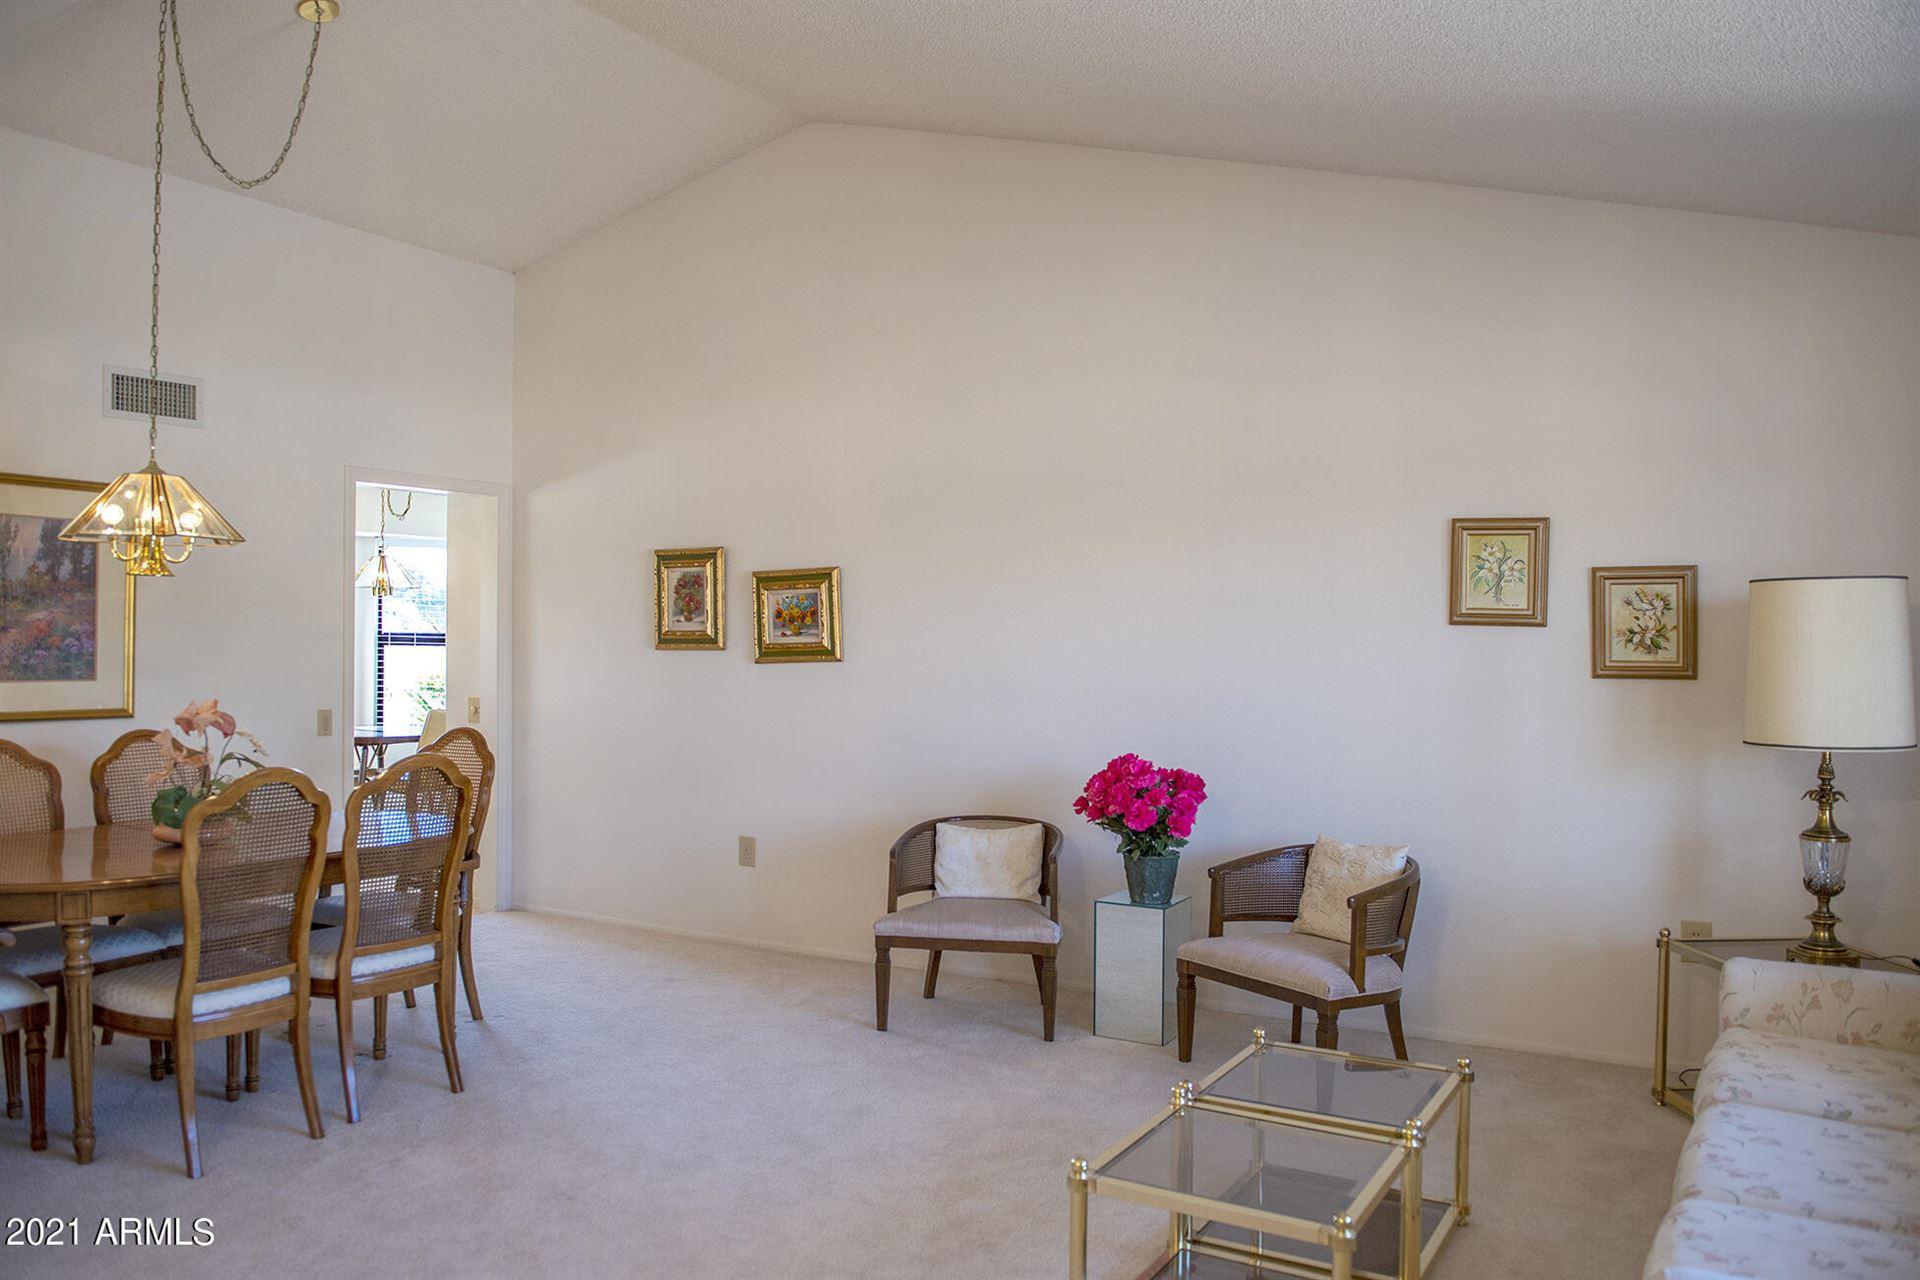 Photo of 13615 W GABLE HILL Drive, Sun City West, AZ 85375 (MLS # 6220053)